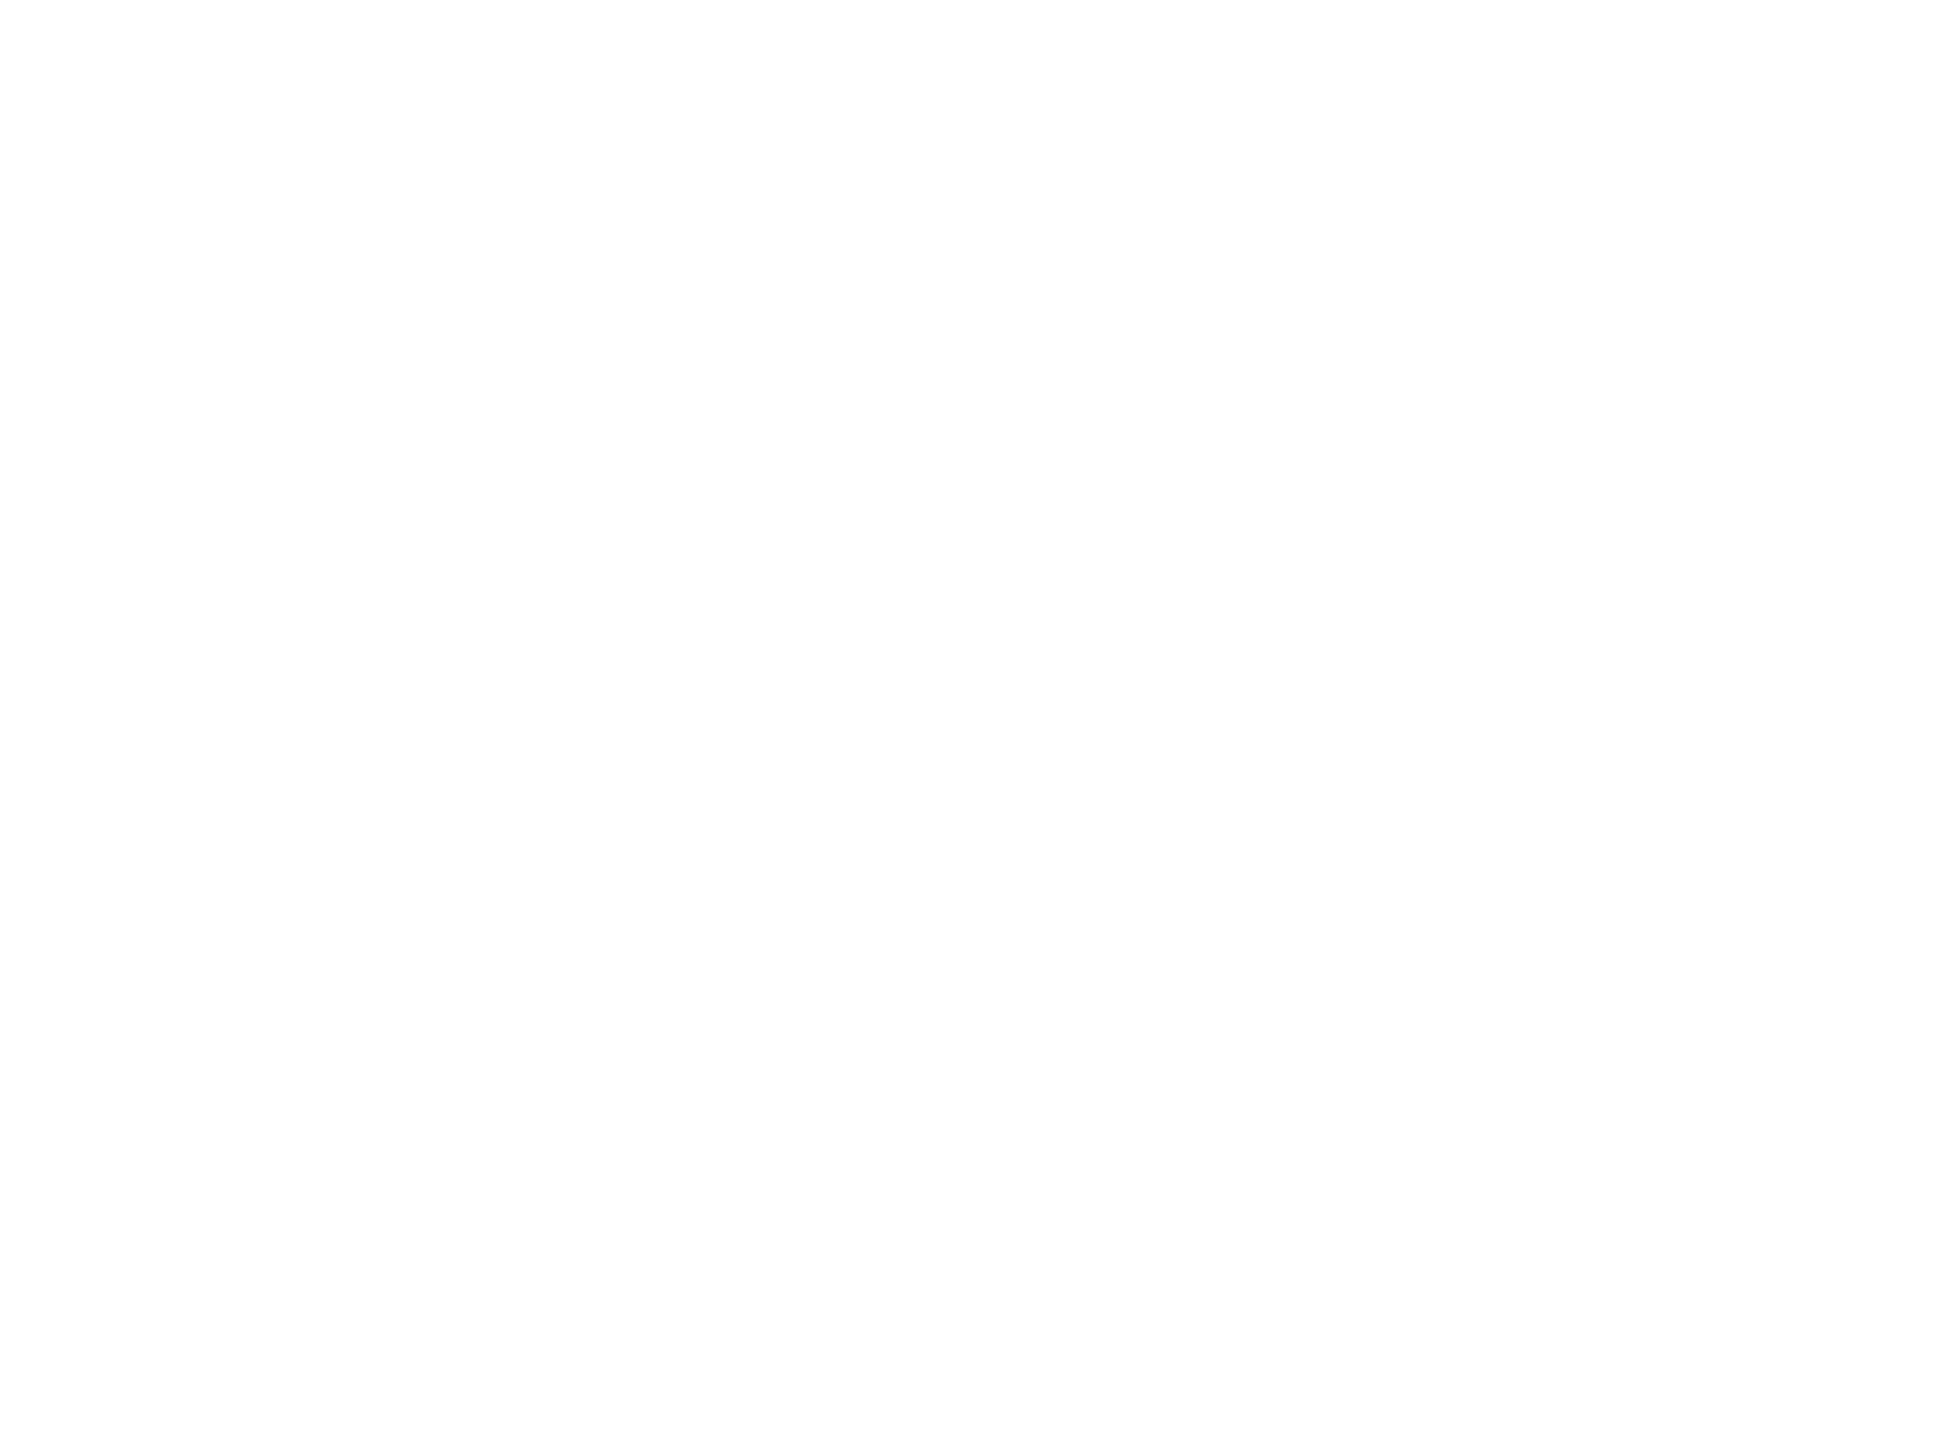 FFSquare_TransparentWhite - Feelin' Film